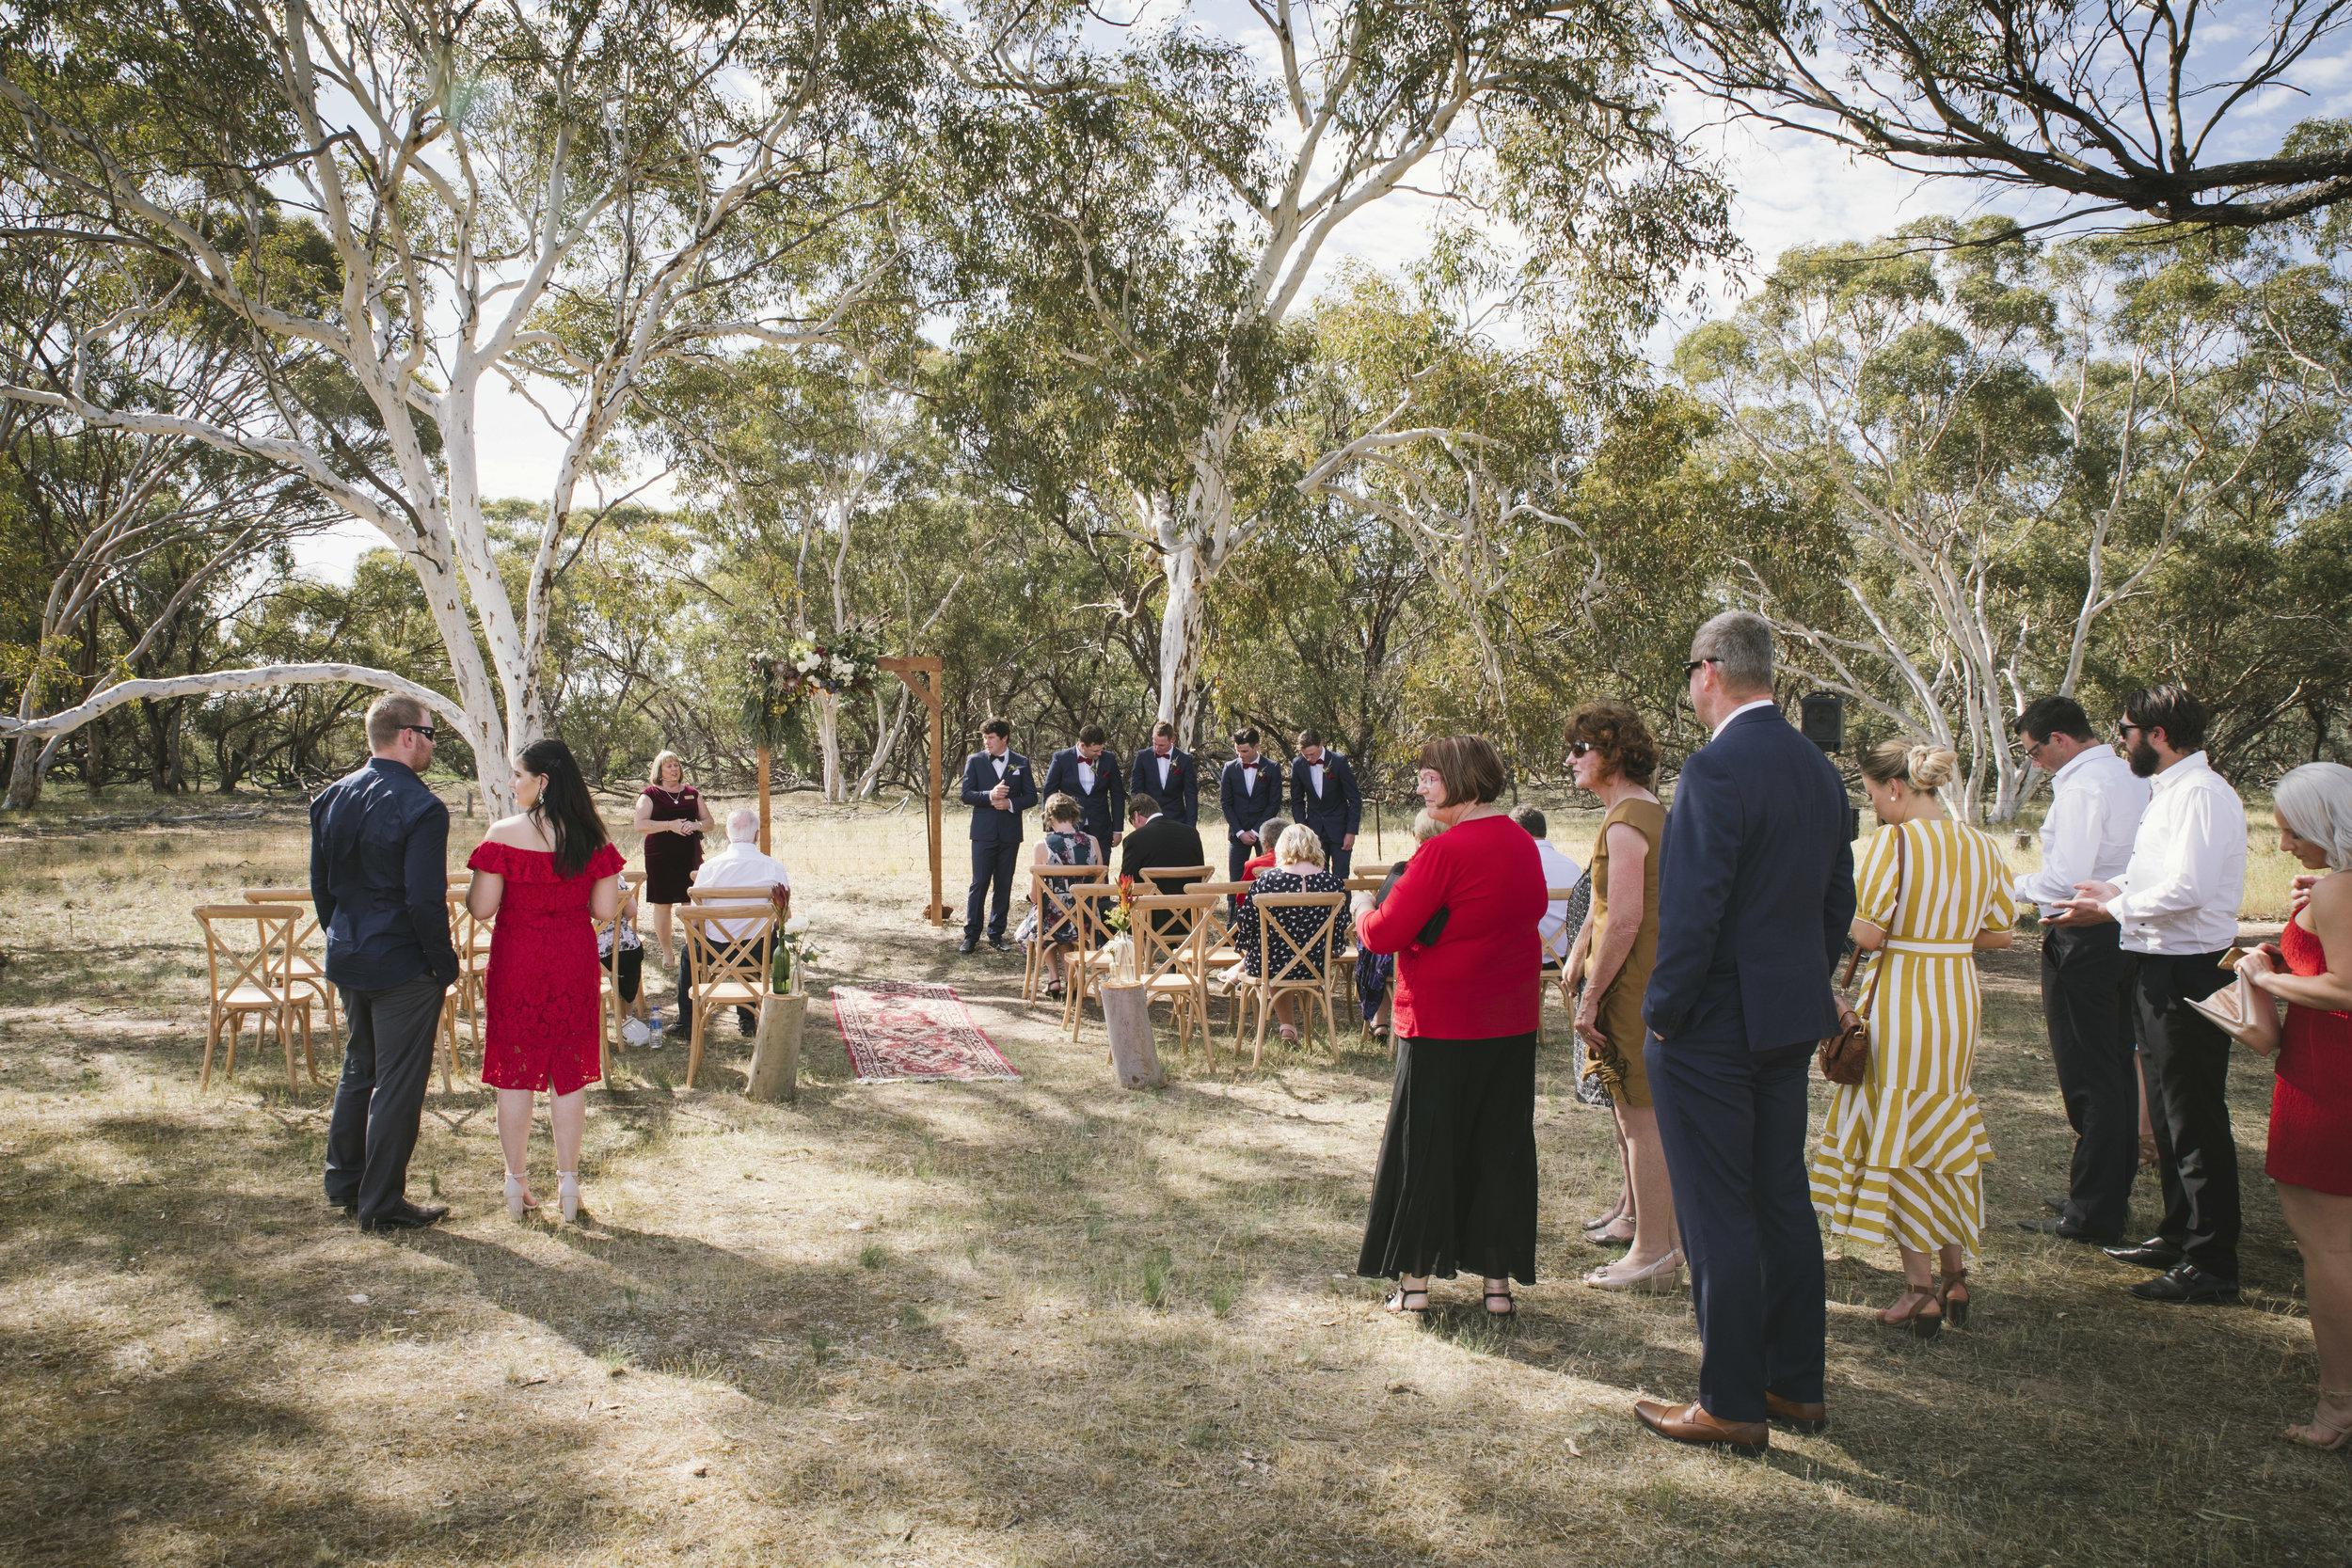 Angie Roe Photography Wheatbelt Avon Valley Farm Wedding (11).jpg